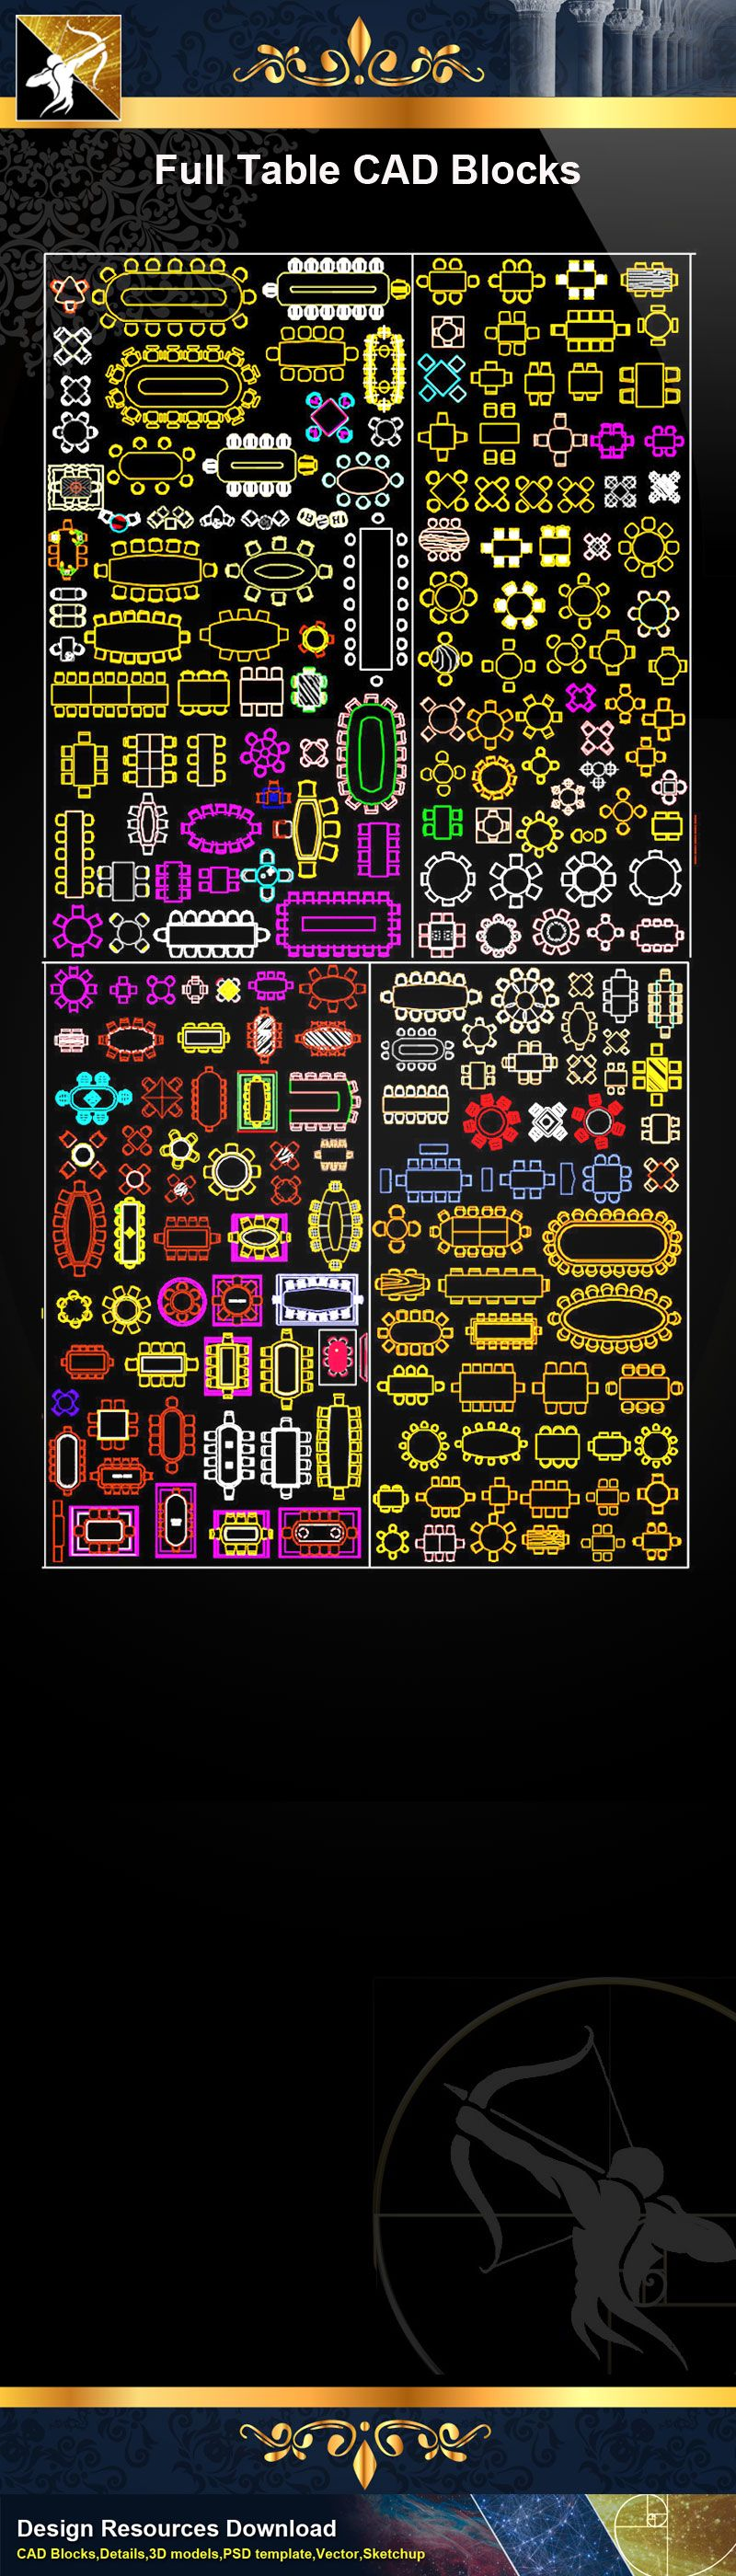 Pin on 【Autocad Blocks,Autocad圖塊,AutocadBlöcke,フリーオートキャド